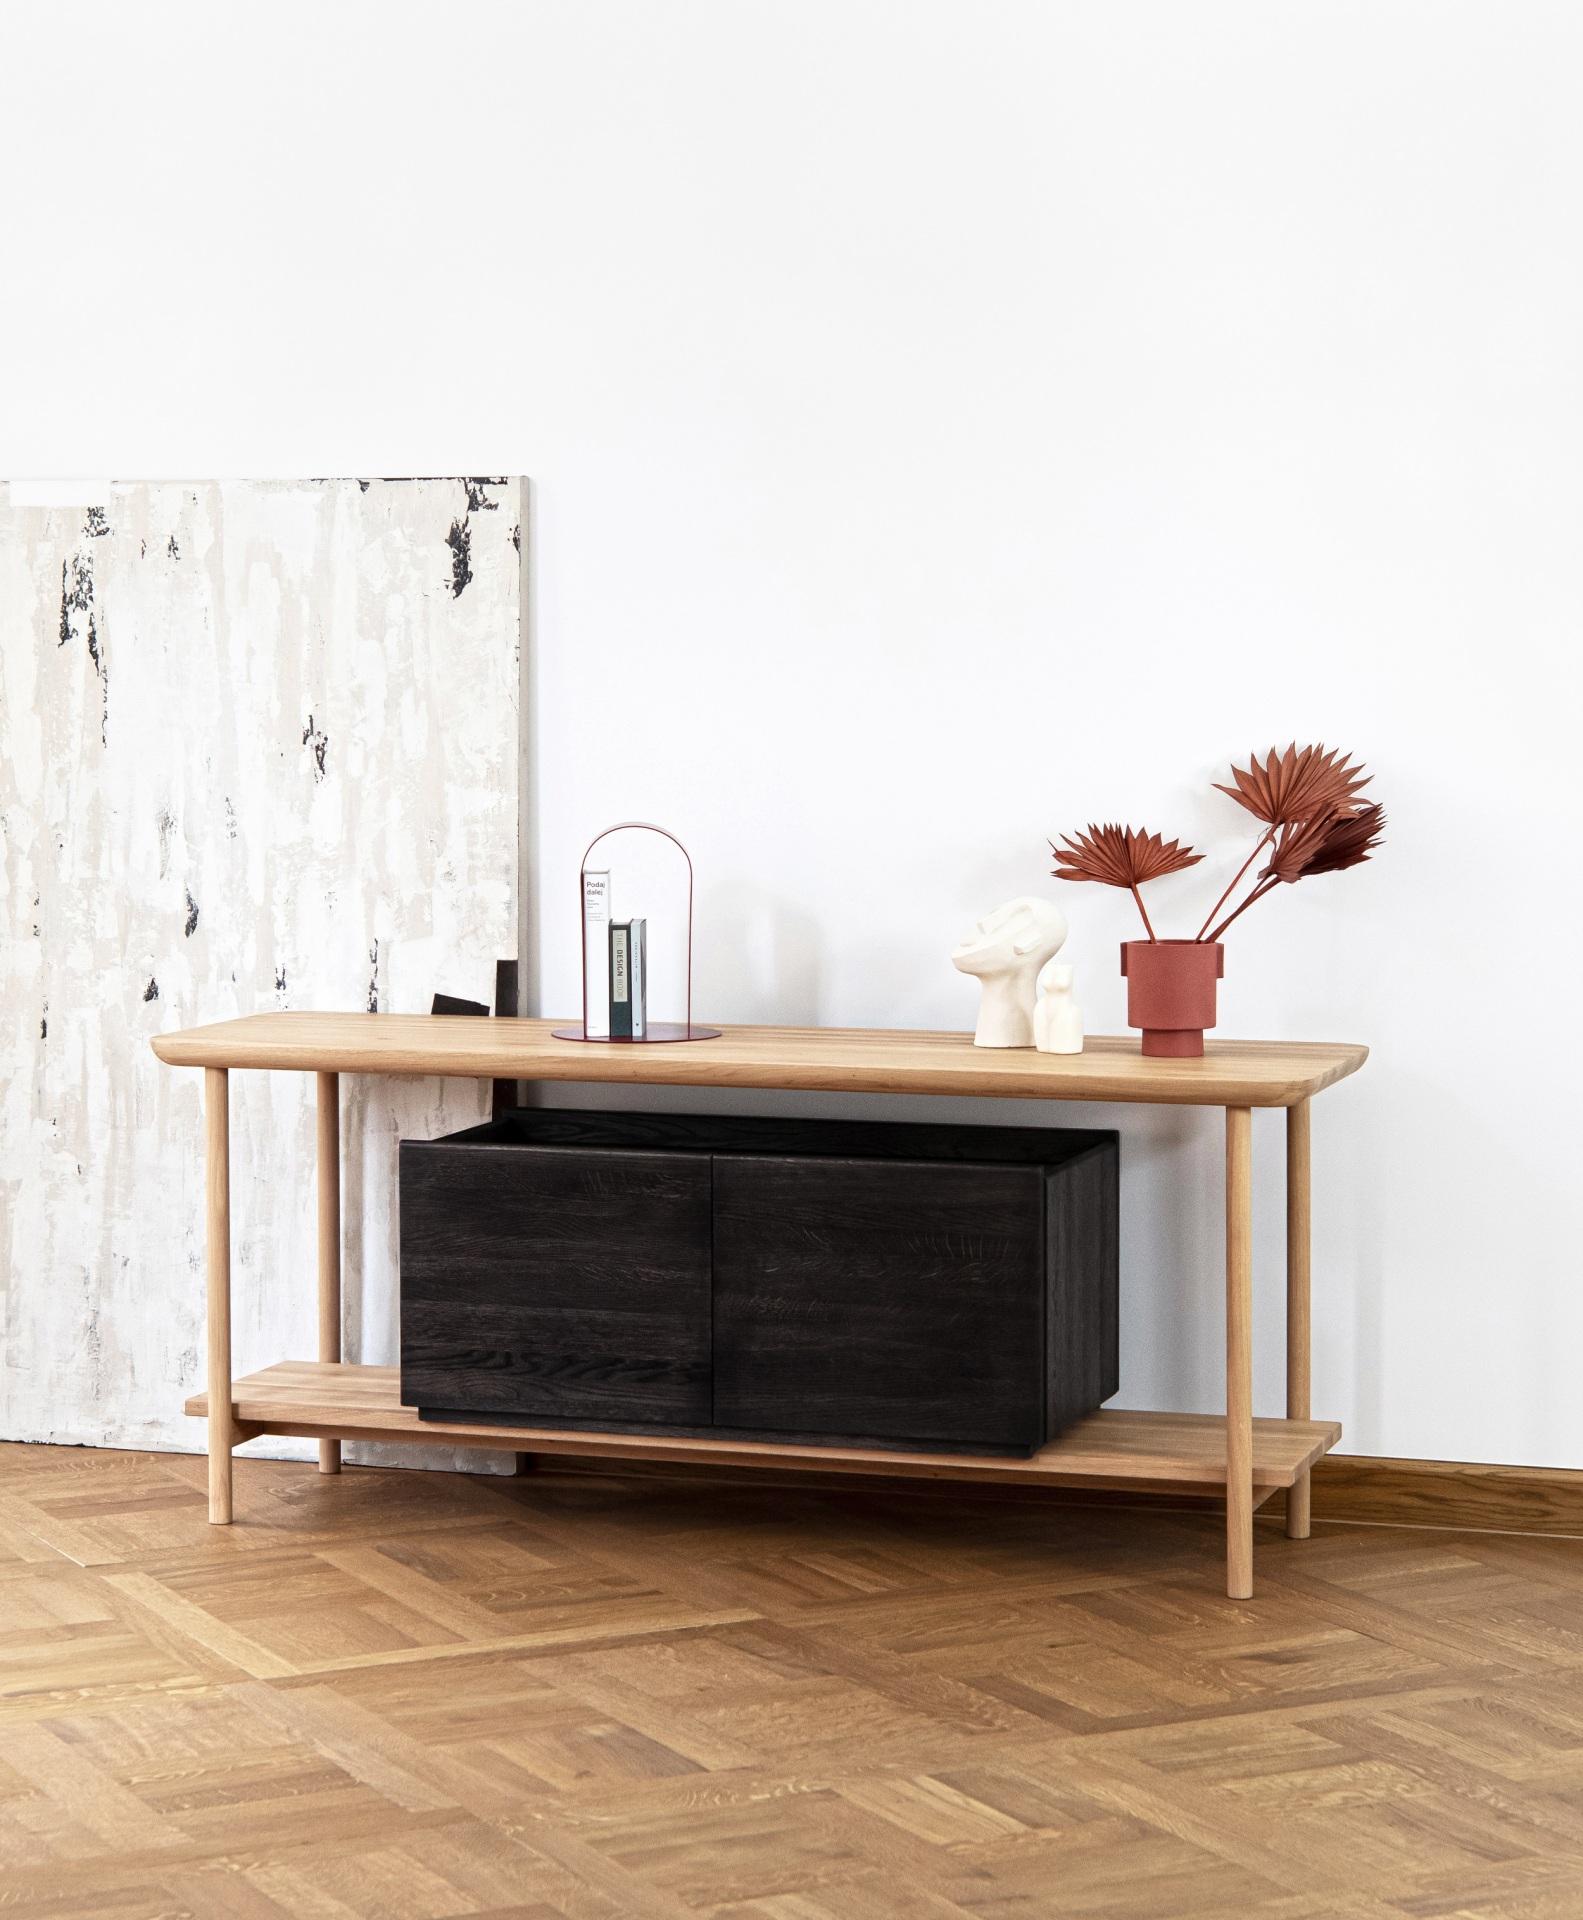 Metropoli_-FONDU-Furniture_designalive_Komoda-Mossa